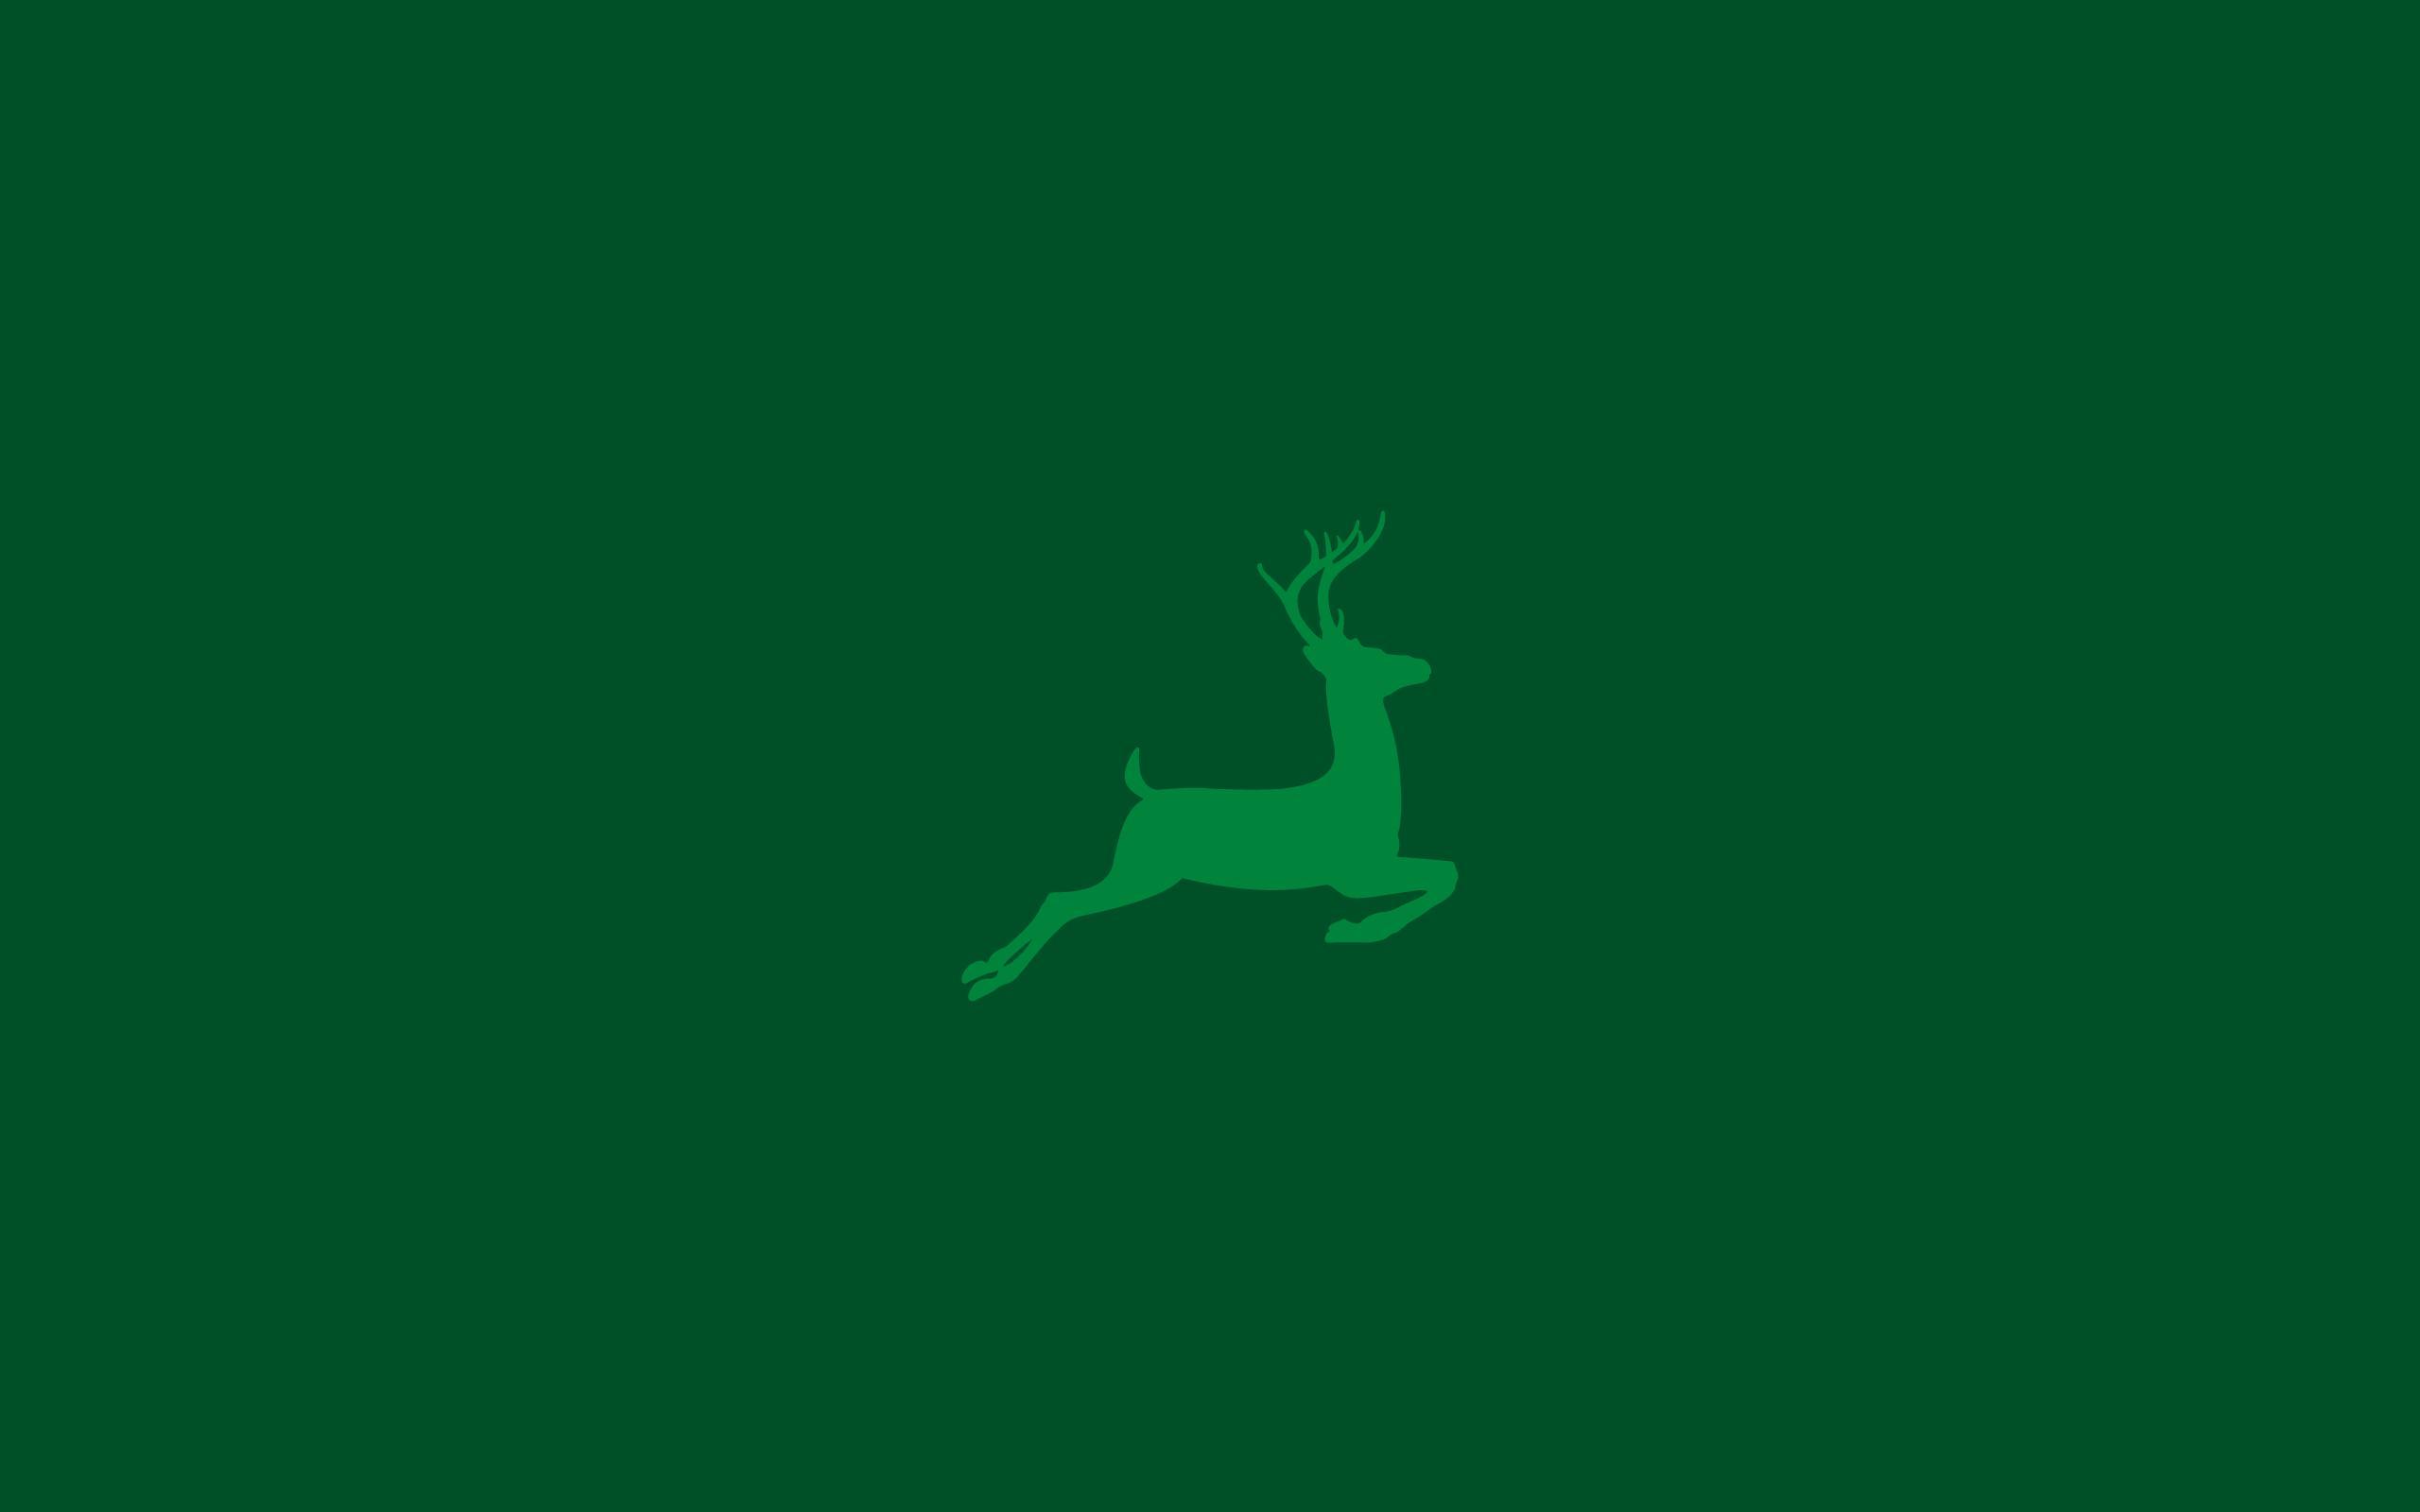 Christmas Green.Christmas Deer Green Background Wallpapers